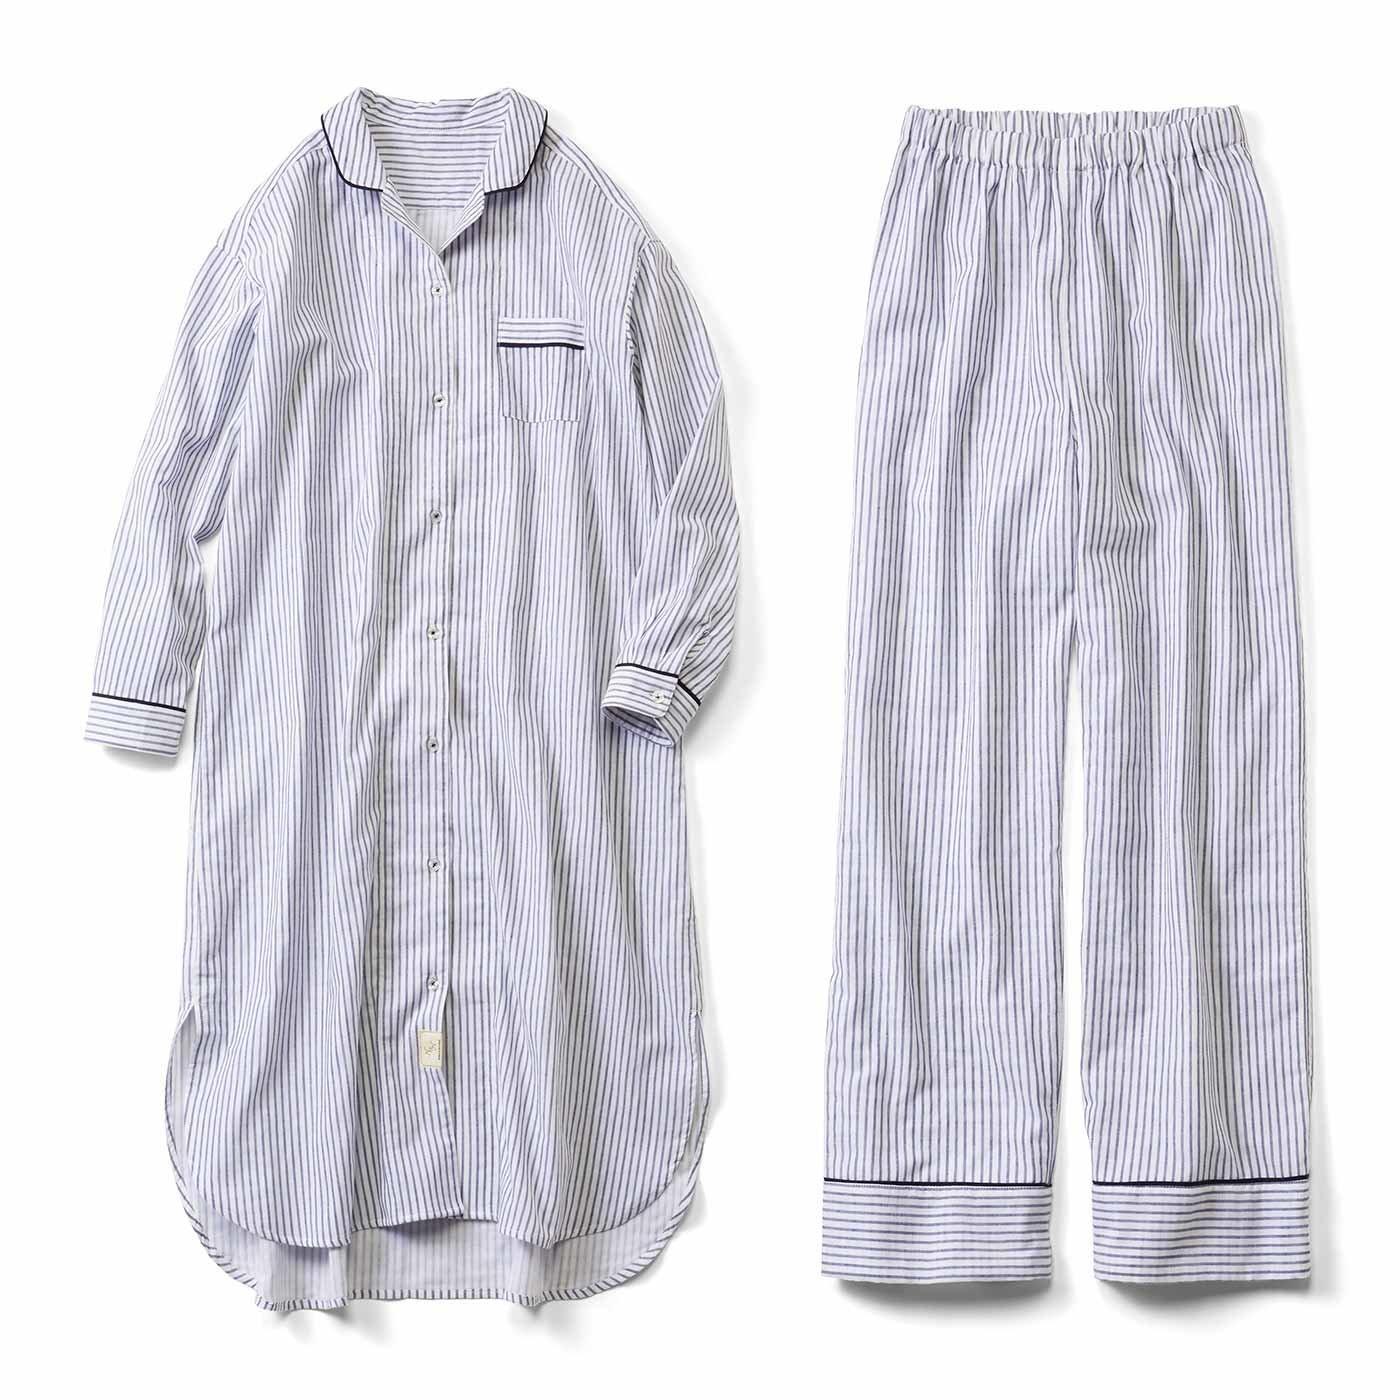 IEDIT[イディット] ダブルガーゼが心地いい ワンピースにもなるお寝坊パジャマ〈ホワイト〉